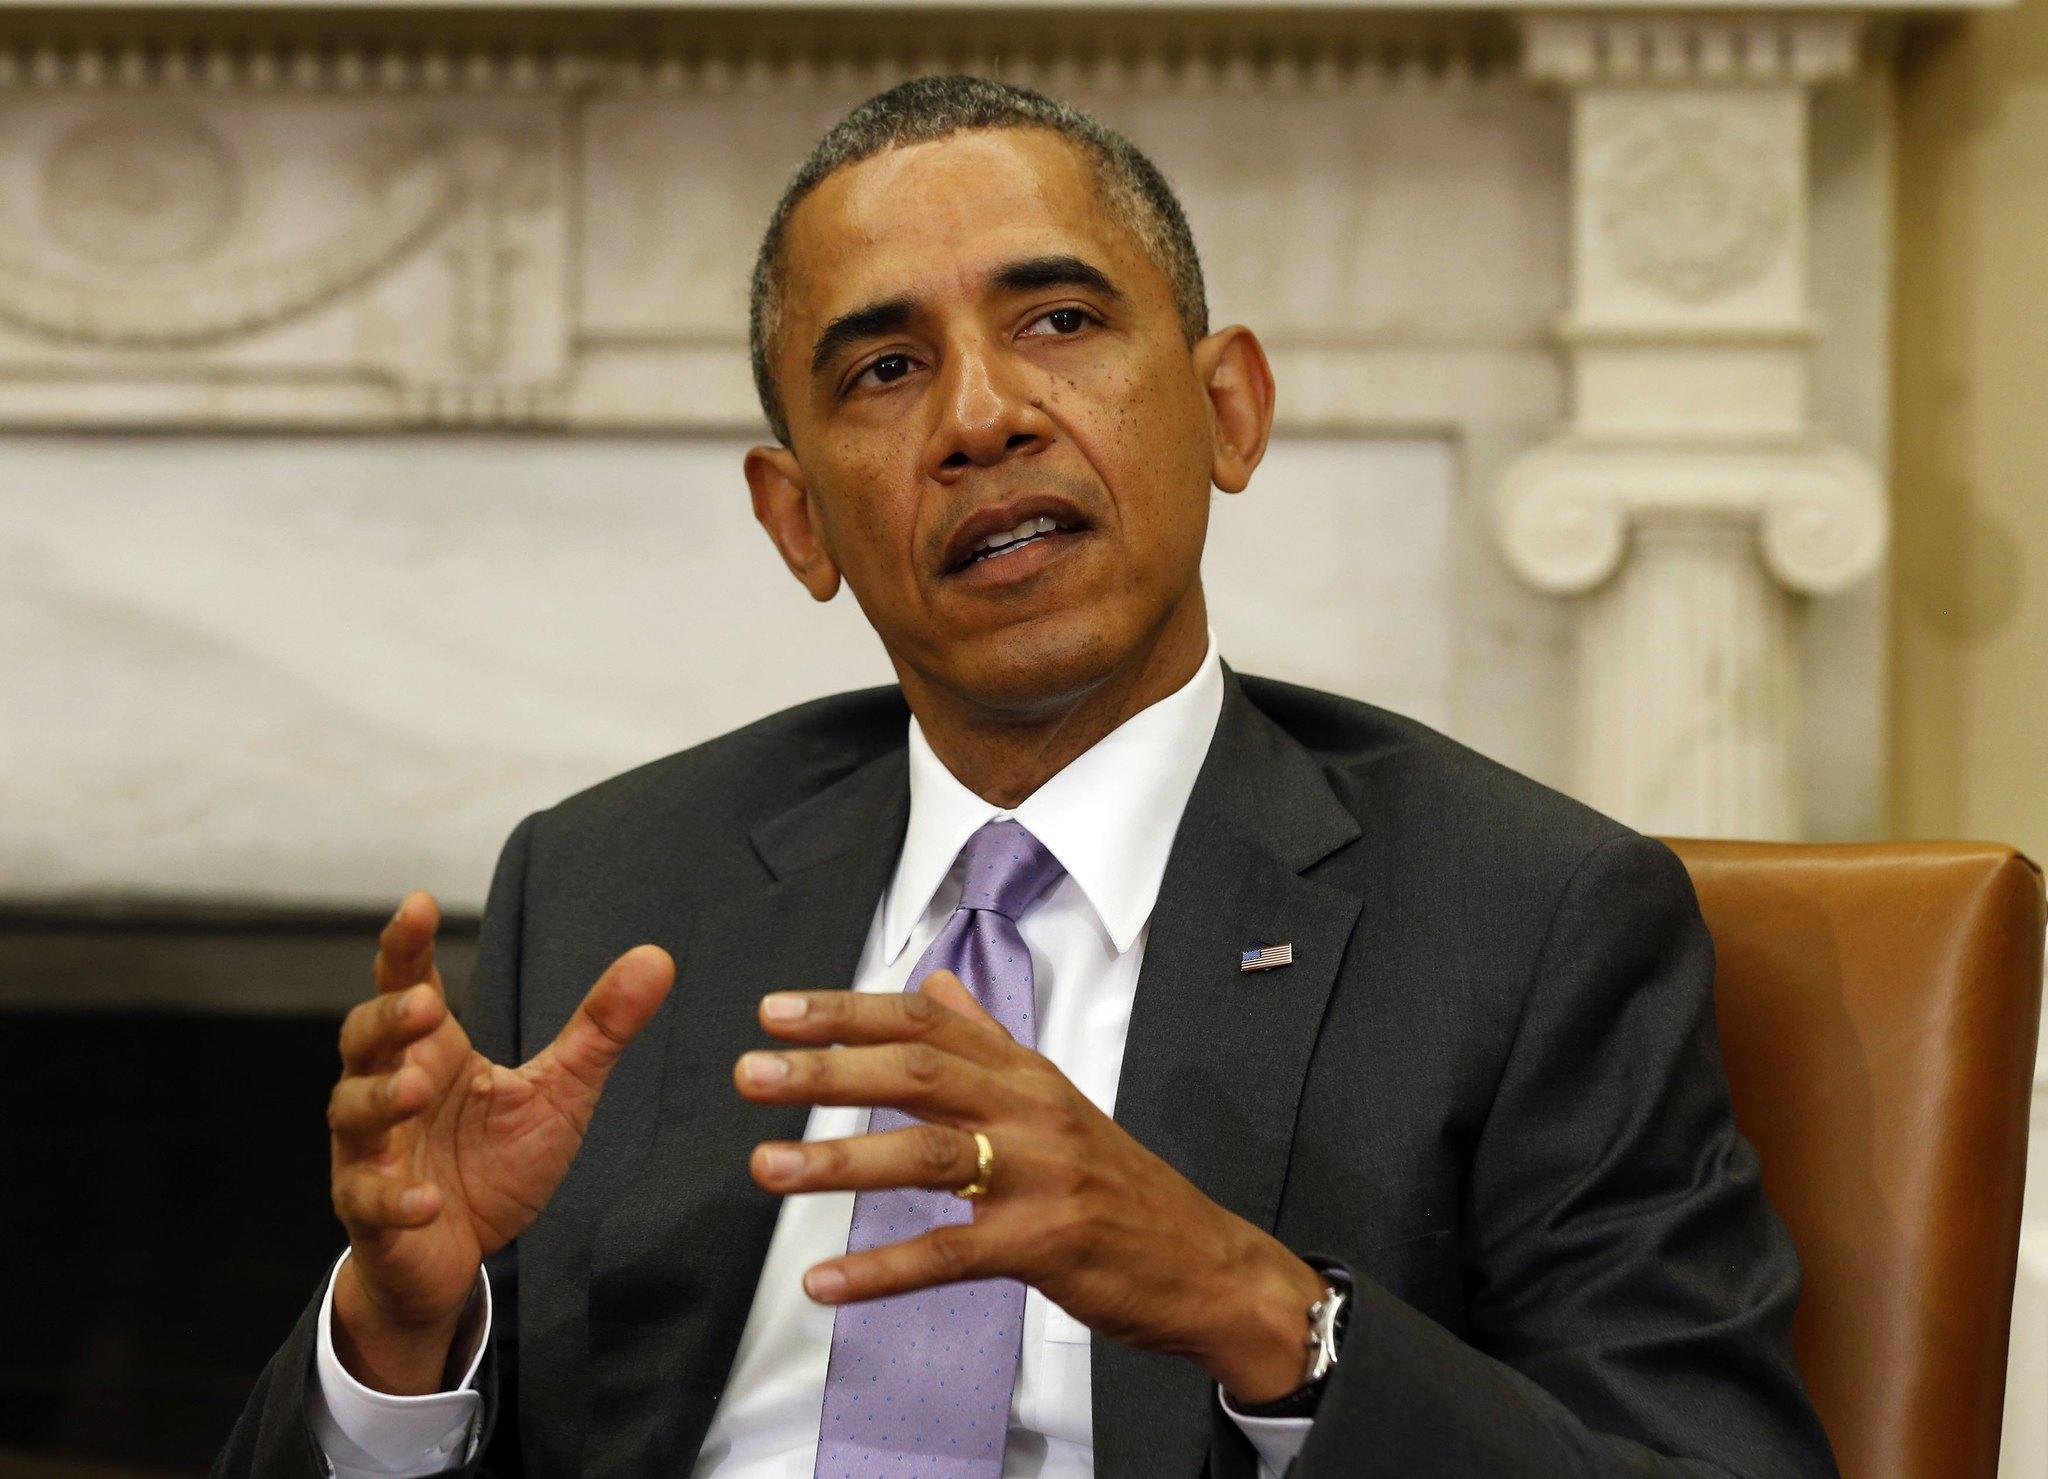 President Barack Obama speaks in the Oval Office of the White House on June 12.